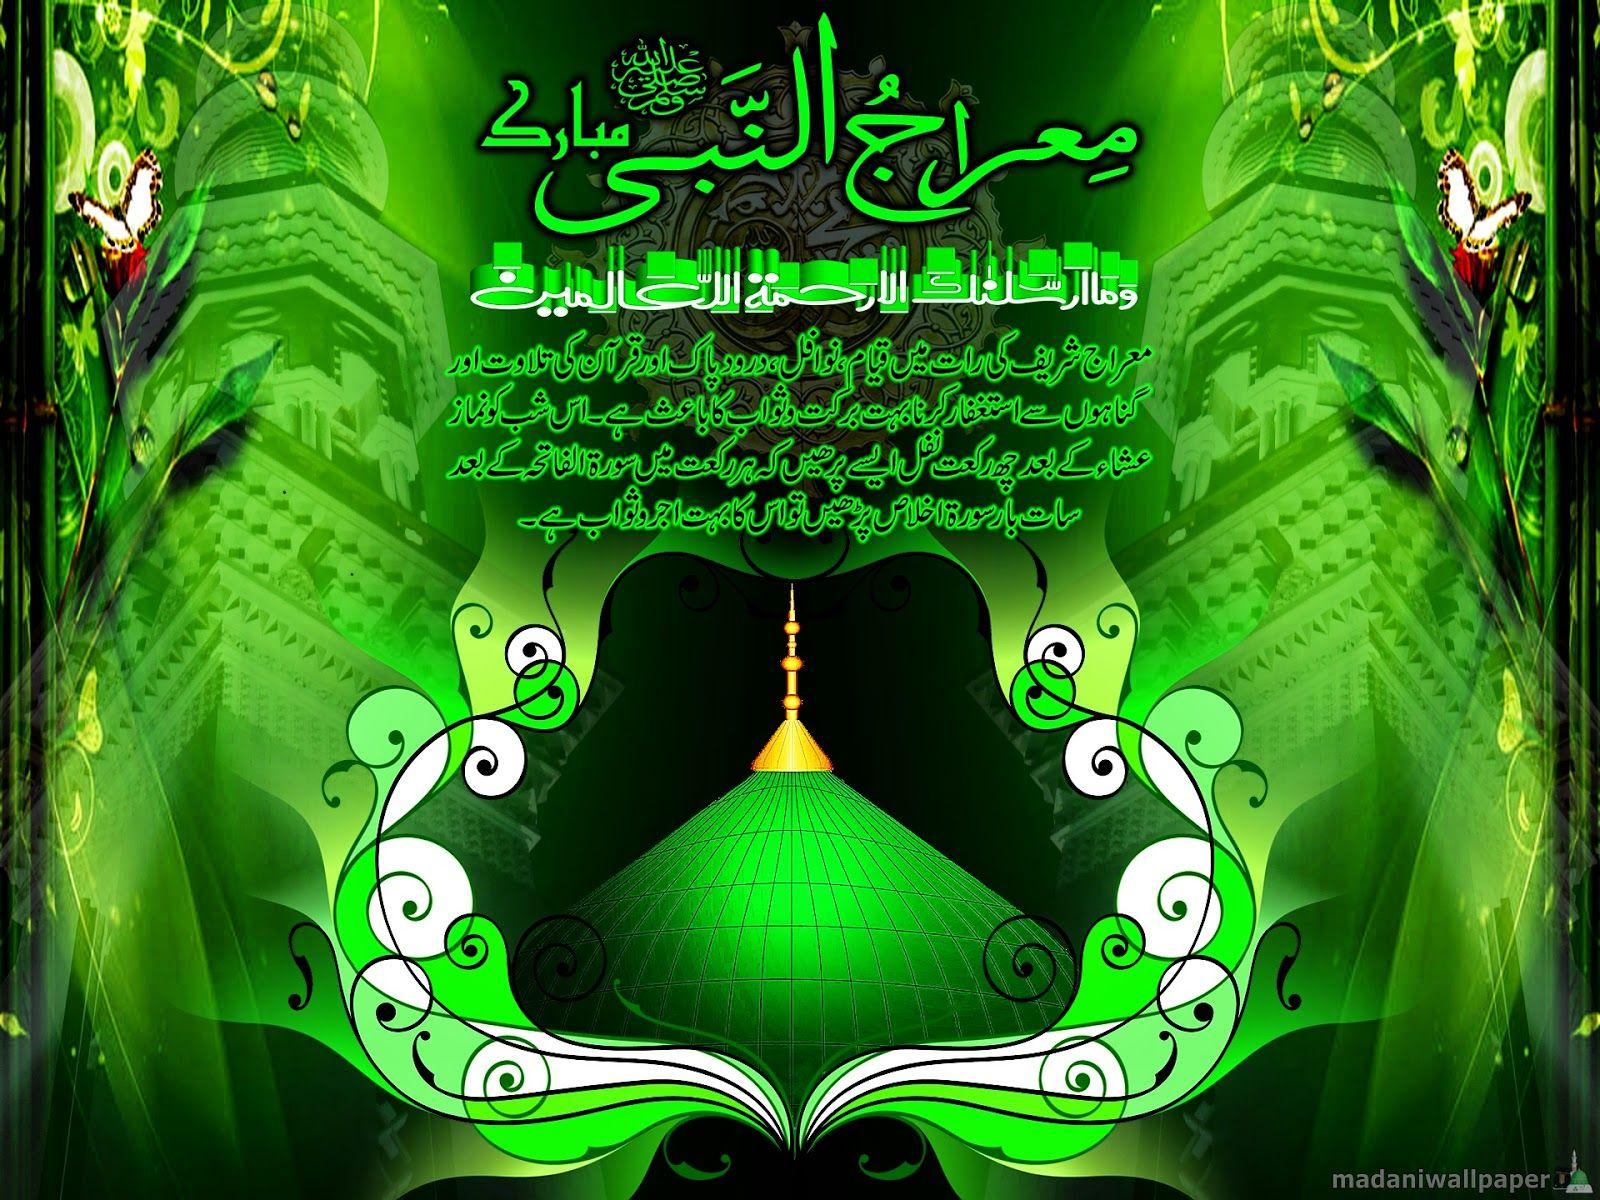 Green Islamic Wallpaper Islamic Wallpaper Hd Quotes desktop for